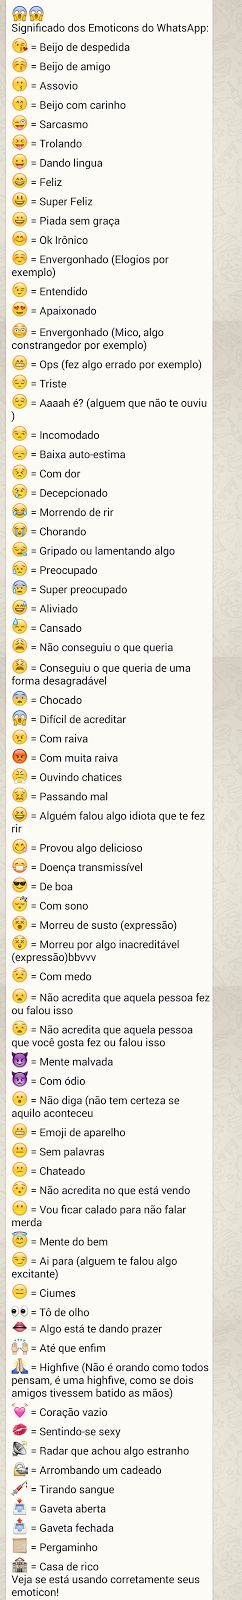 Significados Emoticons Whatsapp!! | Jabuti Rei